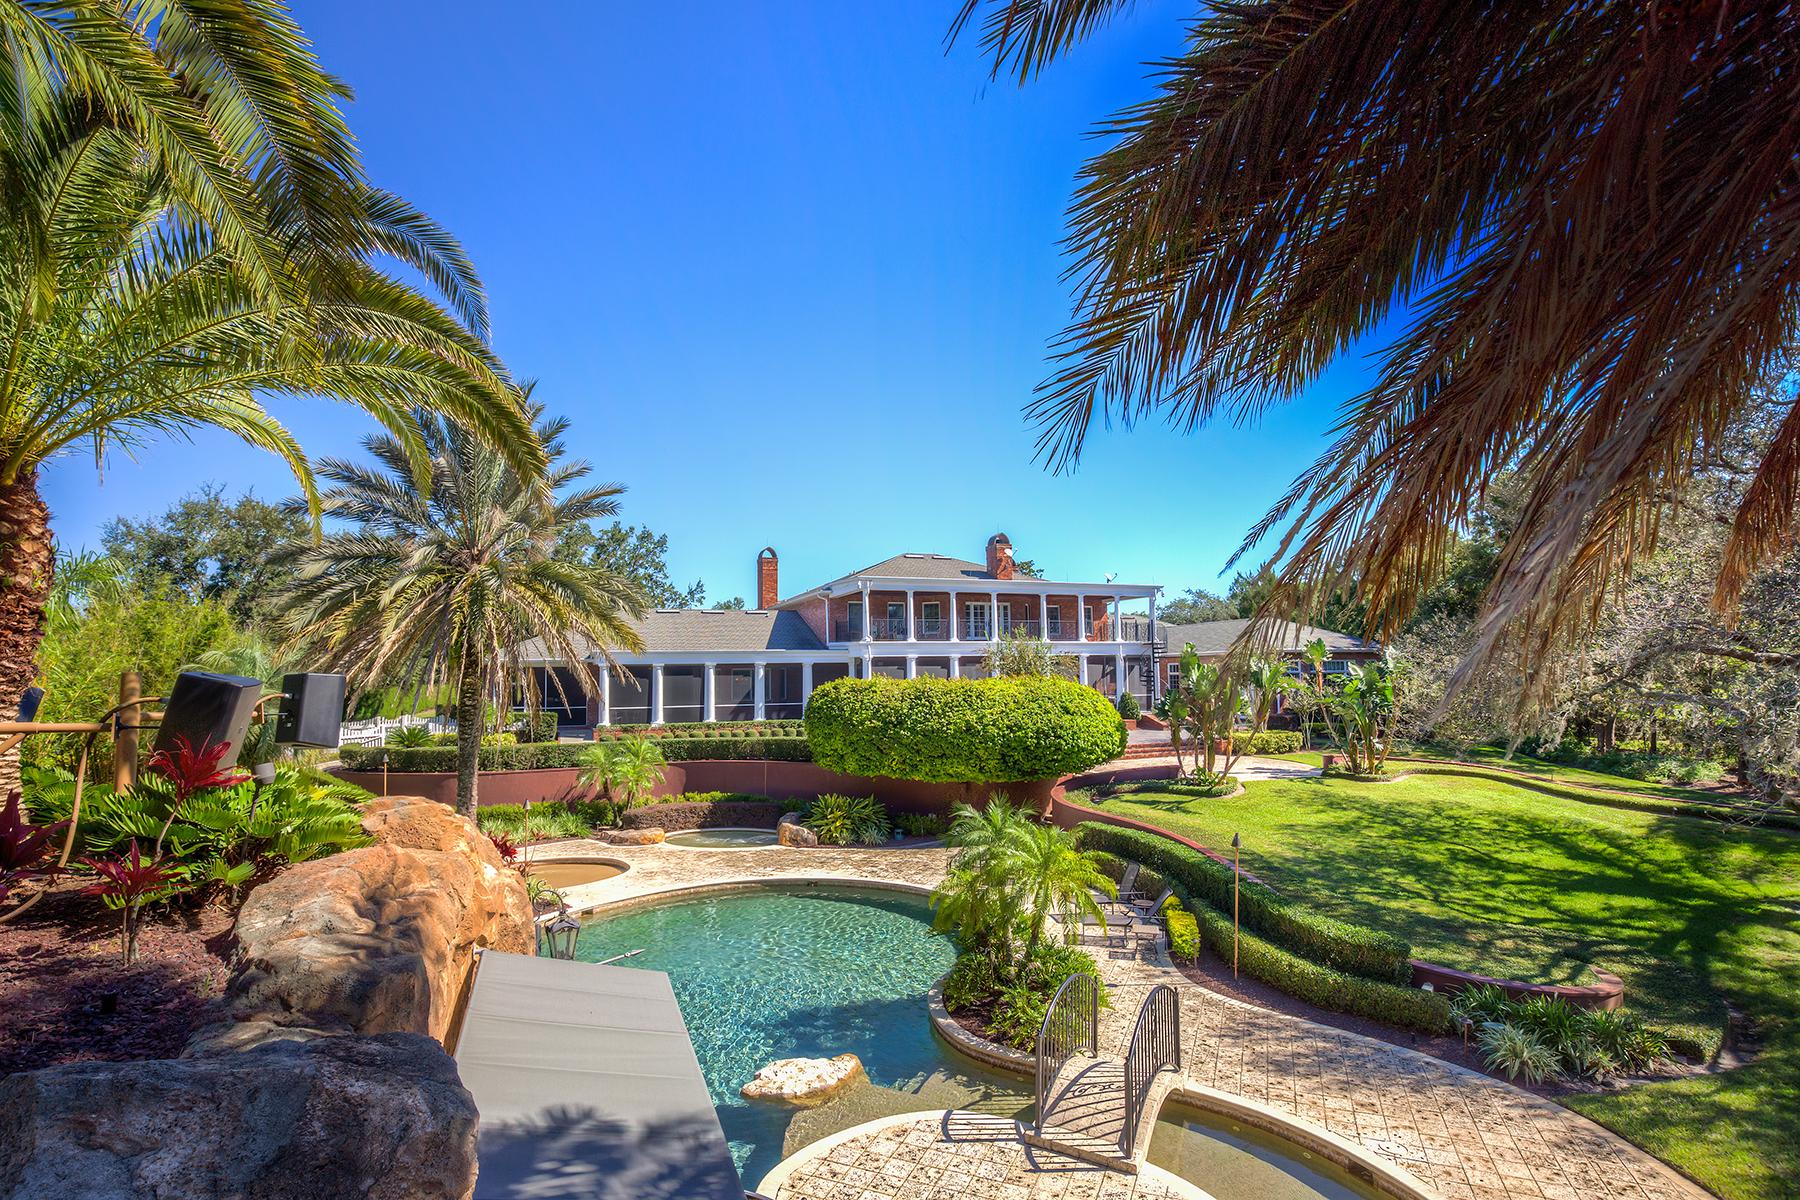 Additional photo for property listing at ORLANDO 9726  Kilgore Rd Orlando, Florida 32836 United States